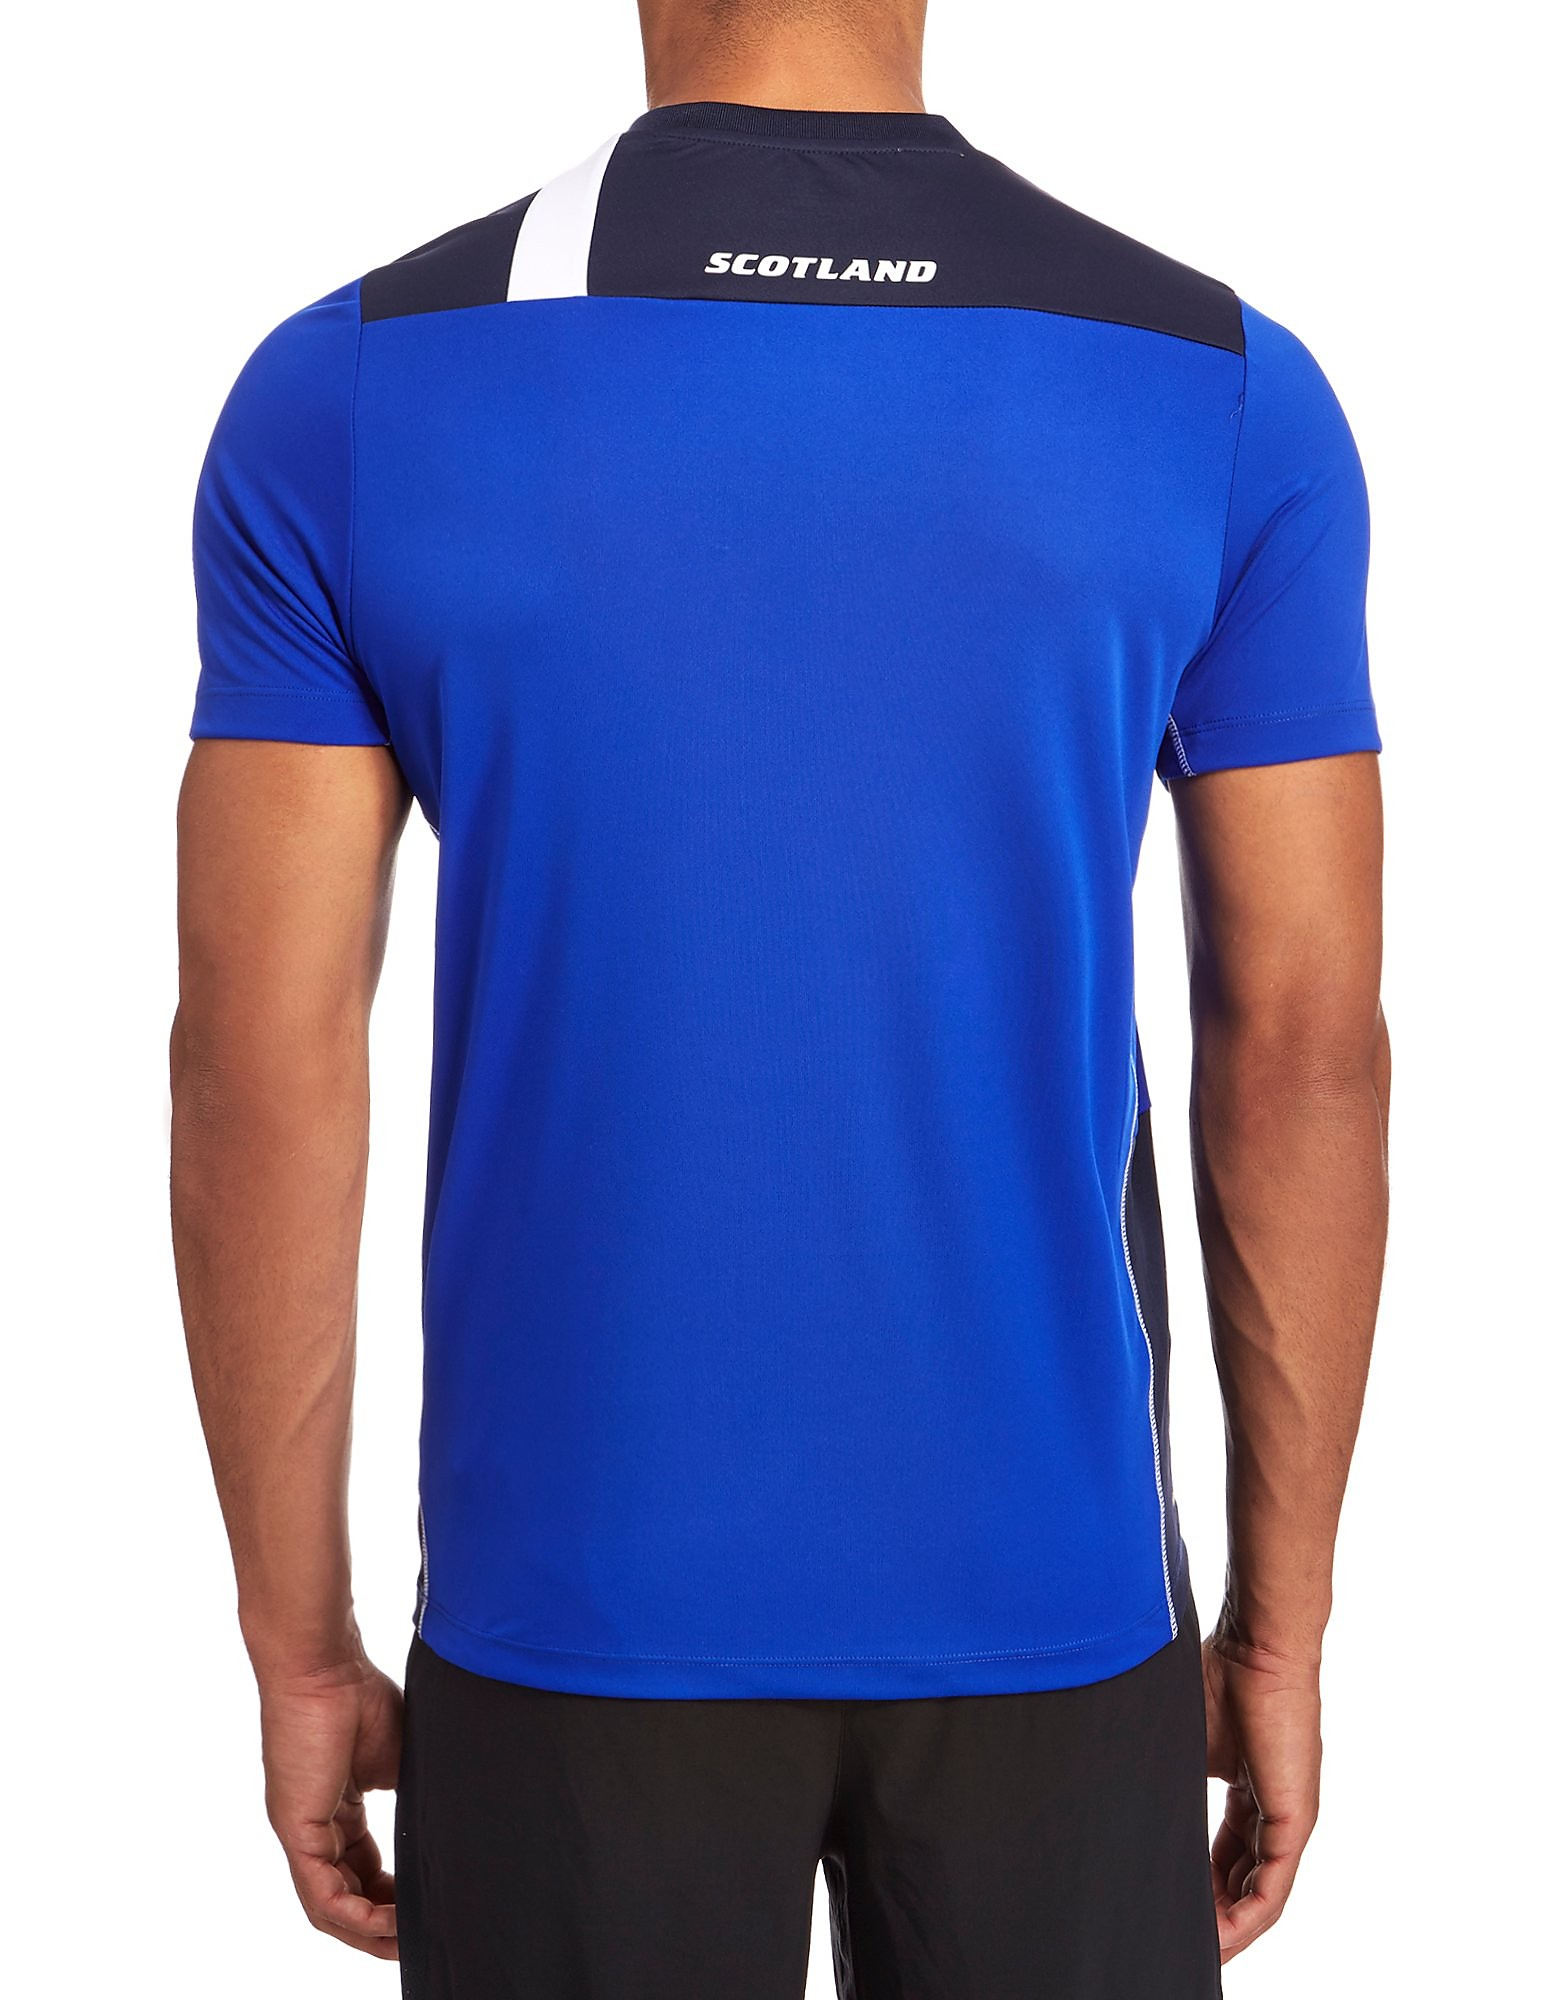 Macron Scotland Poly Shirt